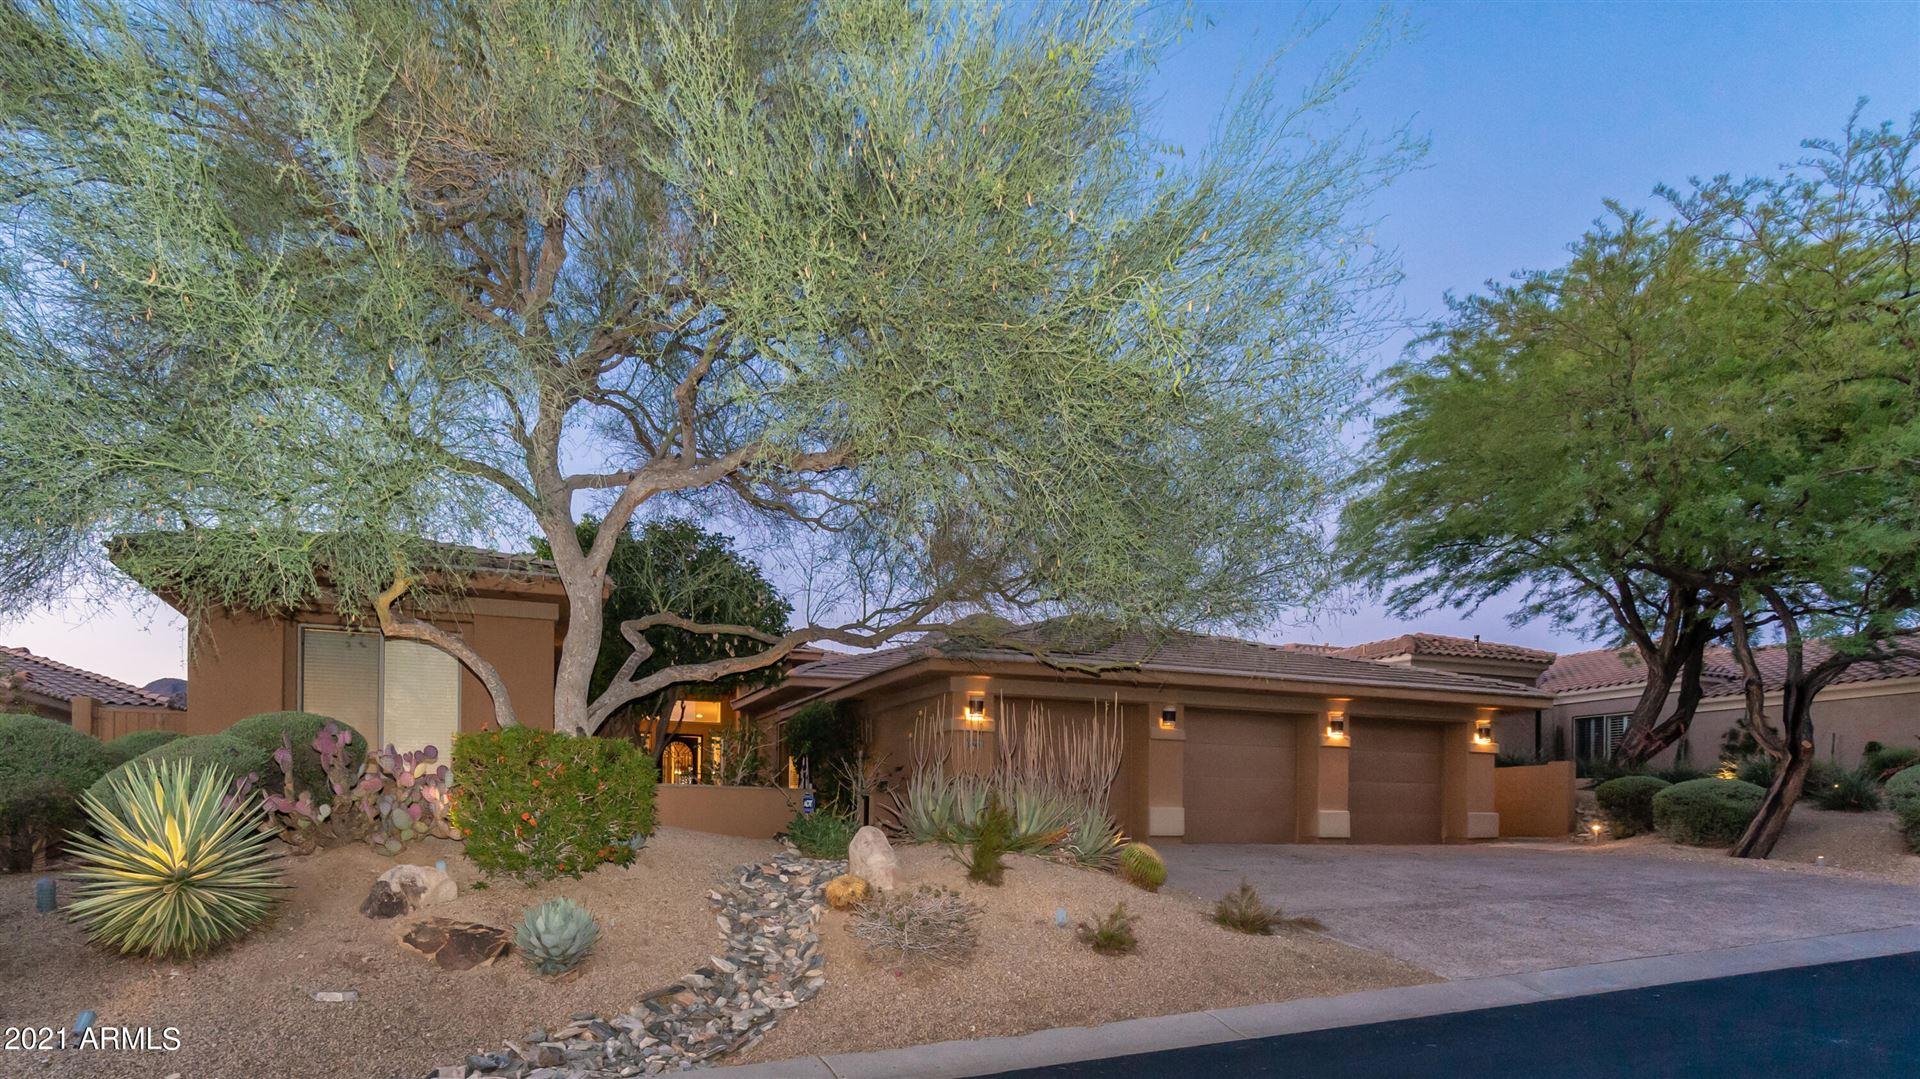 Photo of 11146 E BECK Lane, Scottsdale, AZ 85255 (MLS # 6229201)